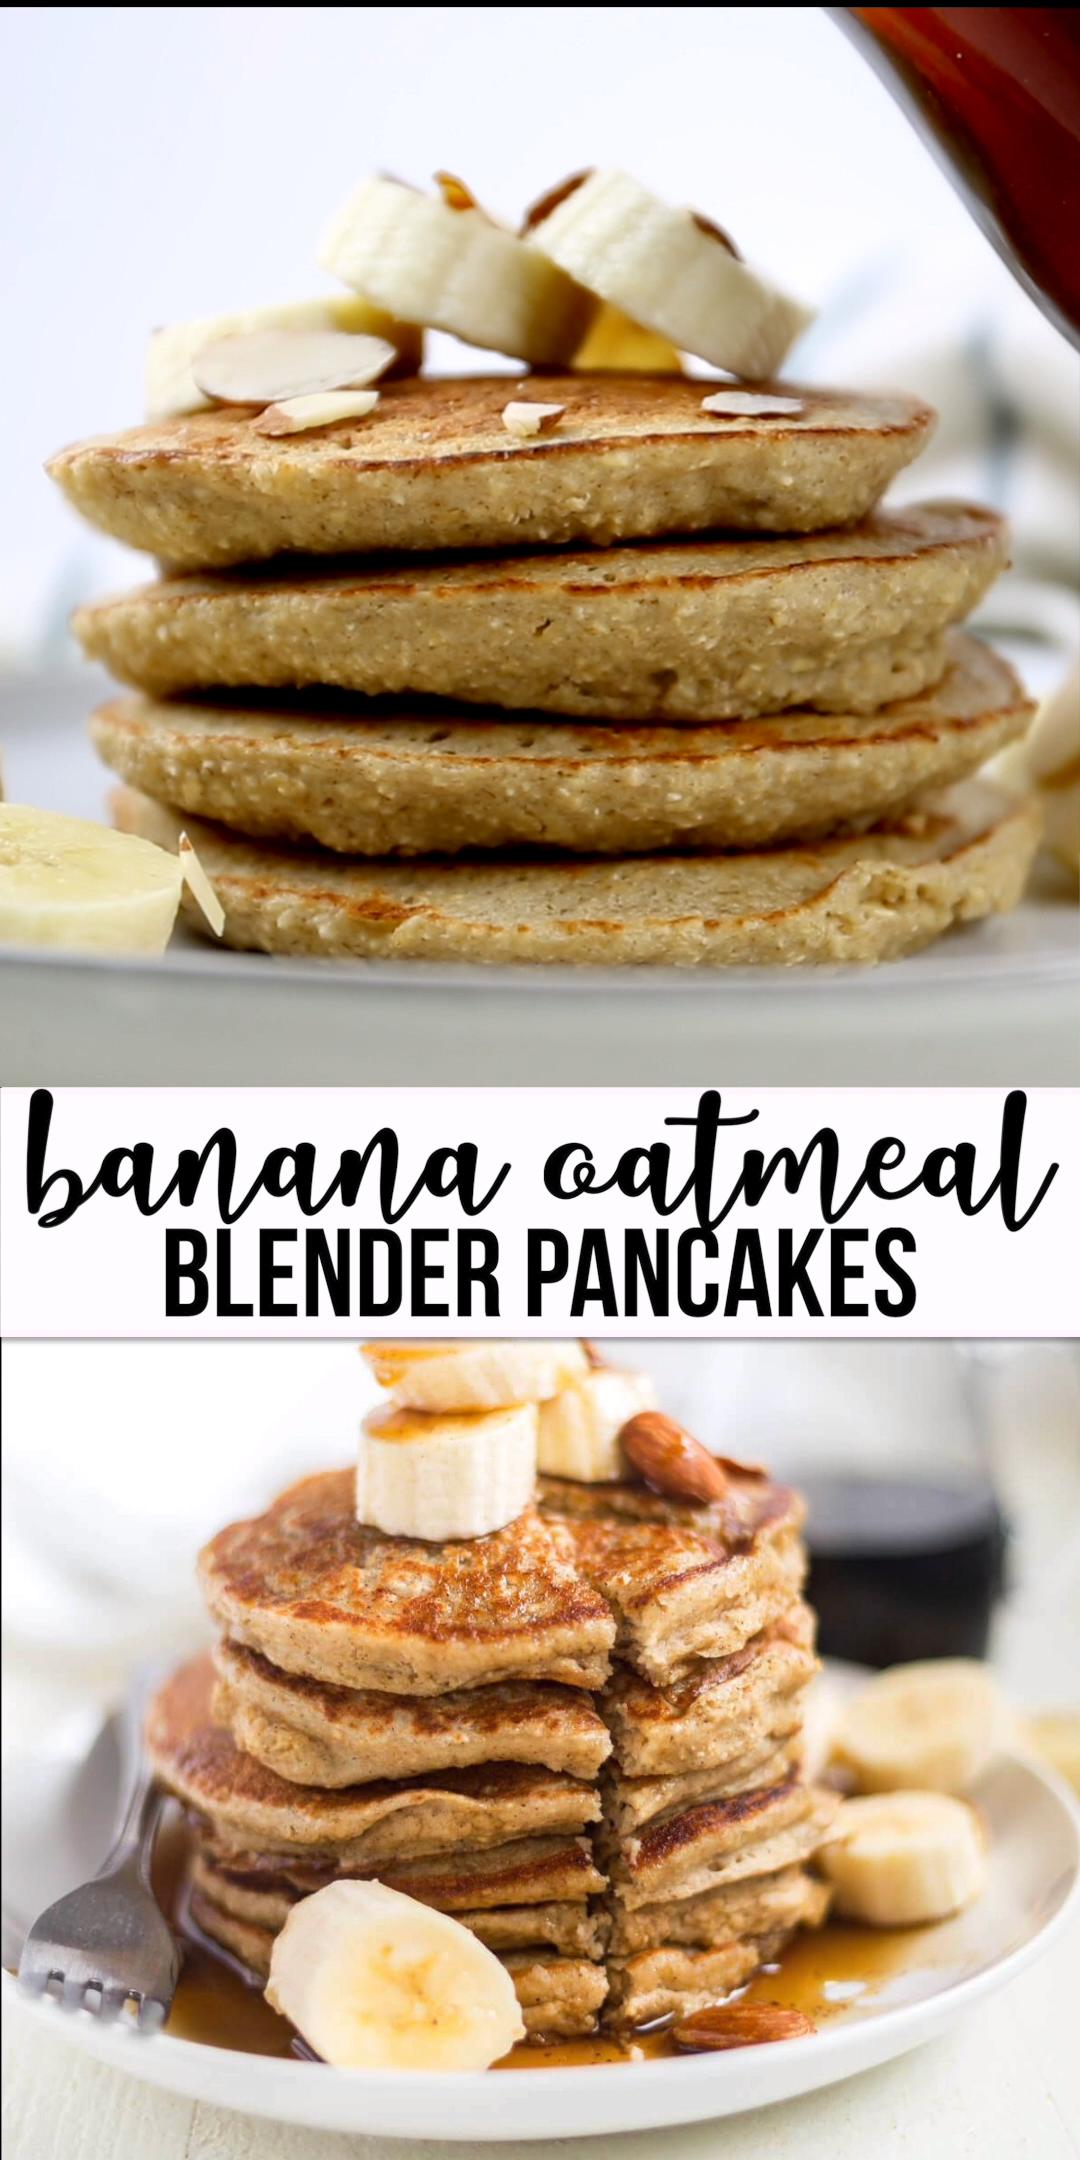 Photo of Banana Oatmeal Blender Pancakes [Gluten Free]